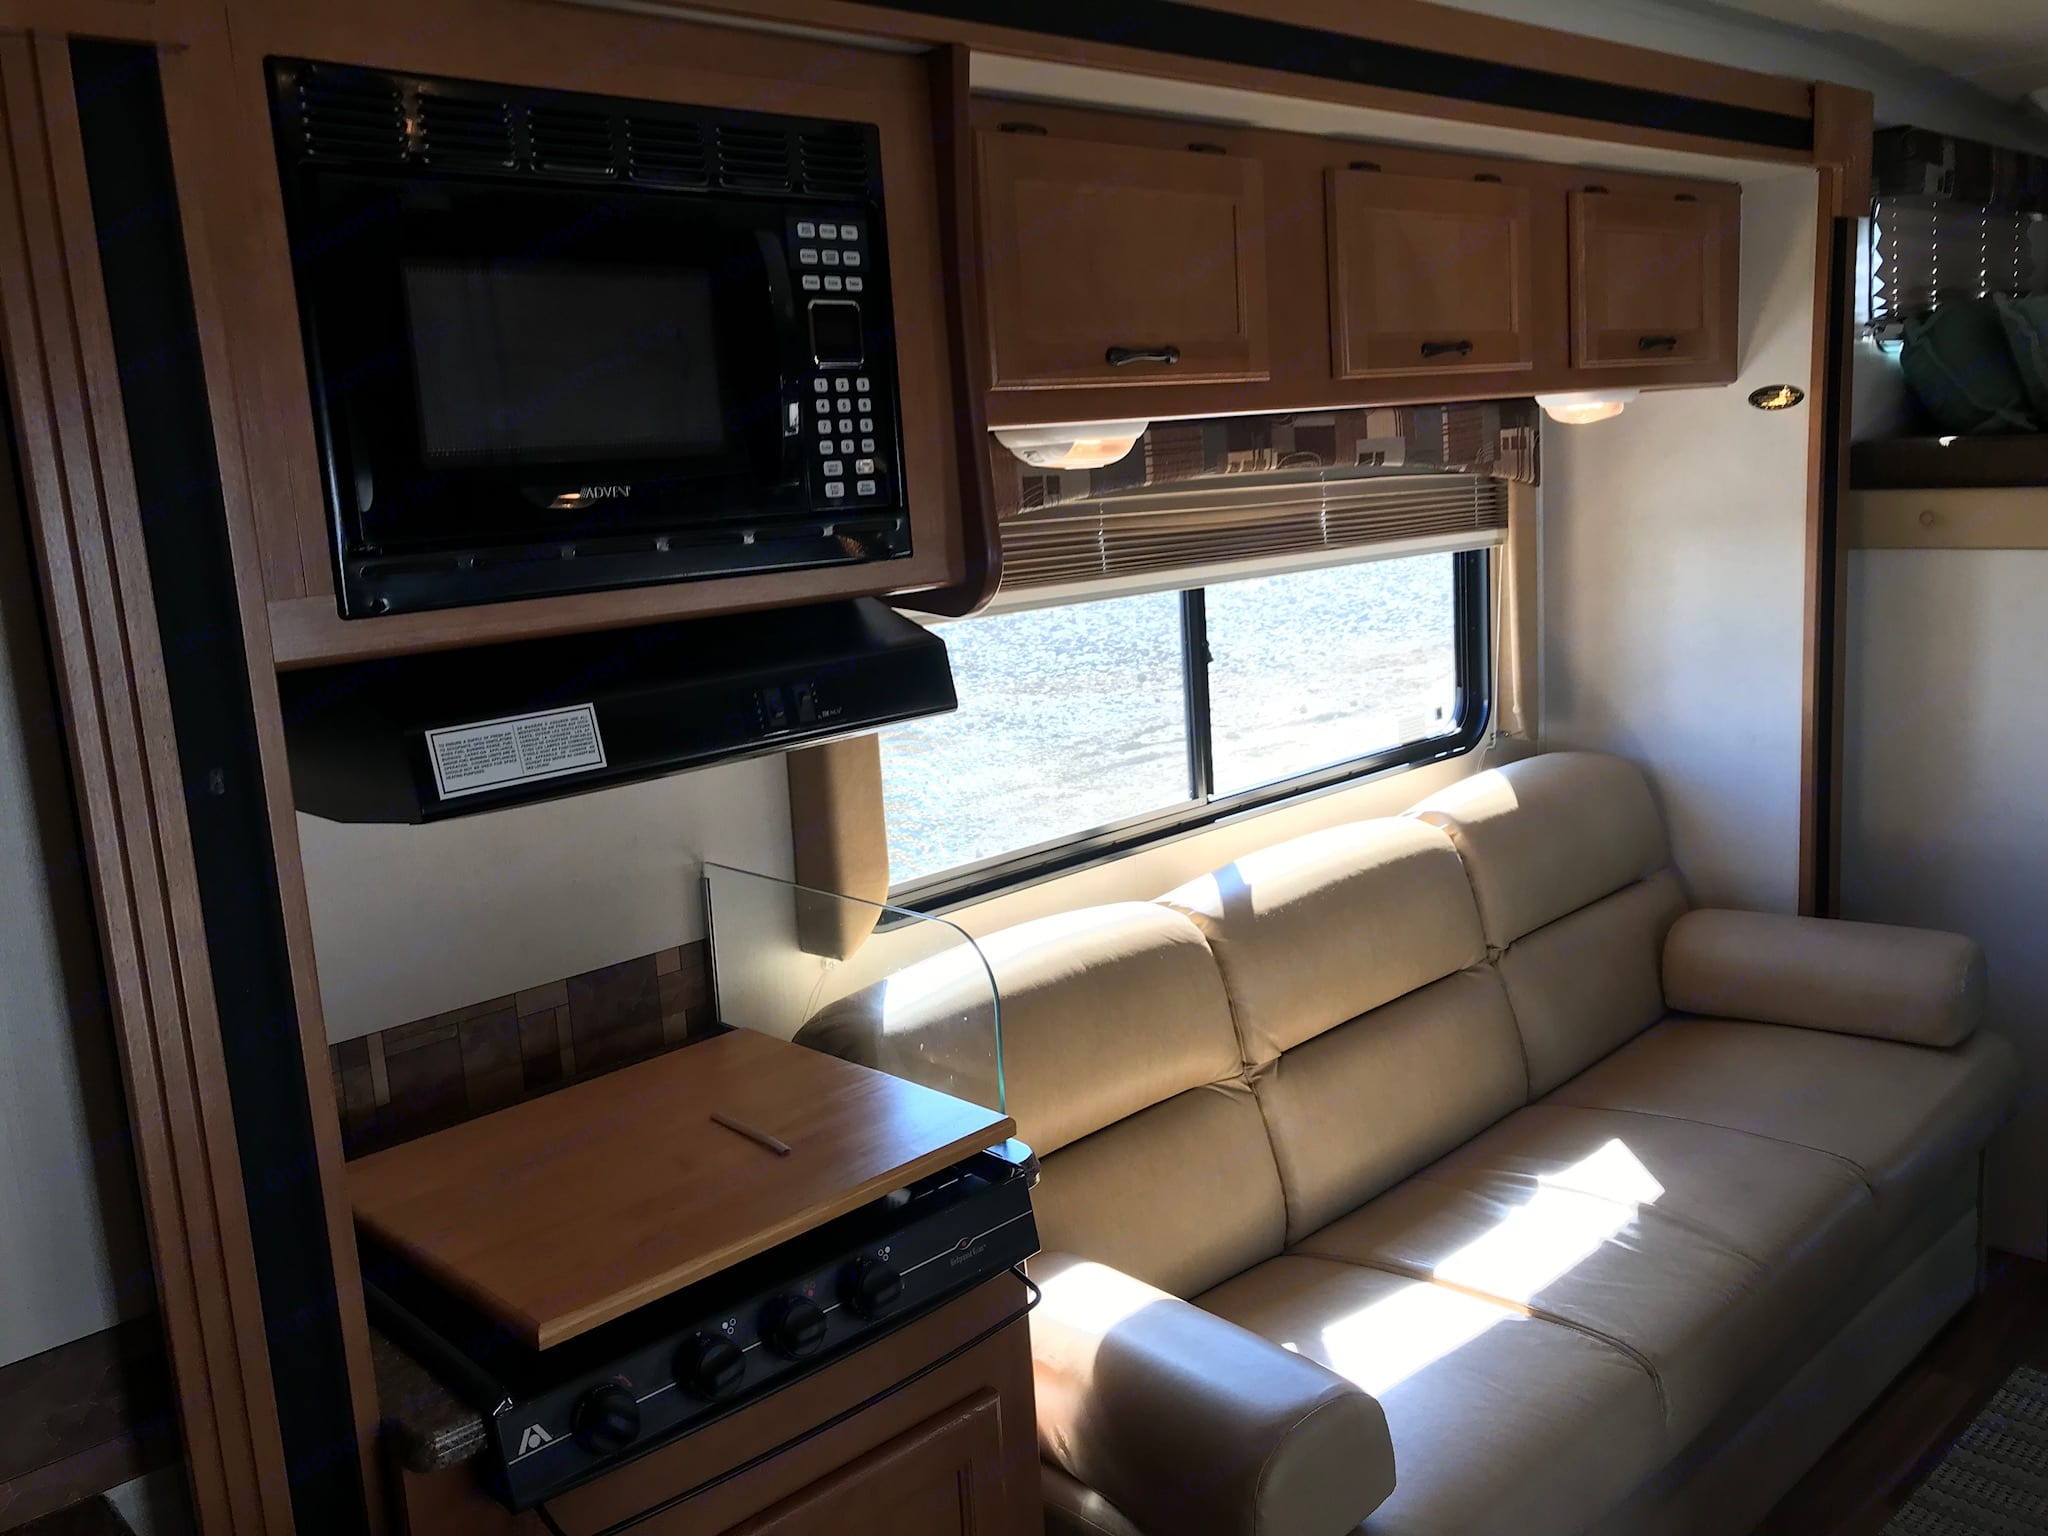 Stove top, Microwave, Sofa. Coachmen Freelander 2013